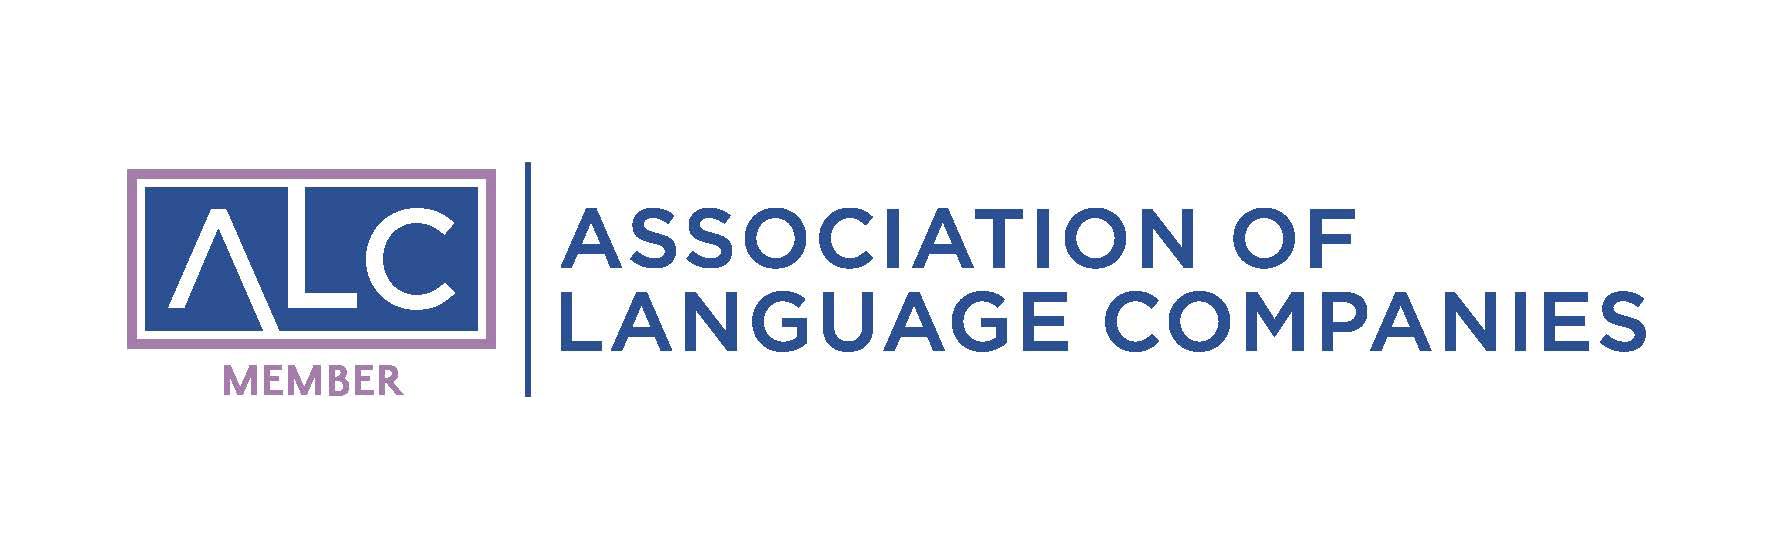 Association of Language Companies Membership